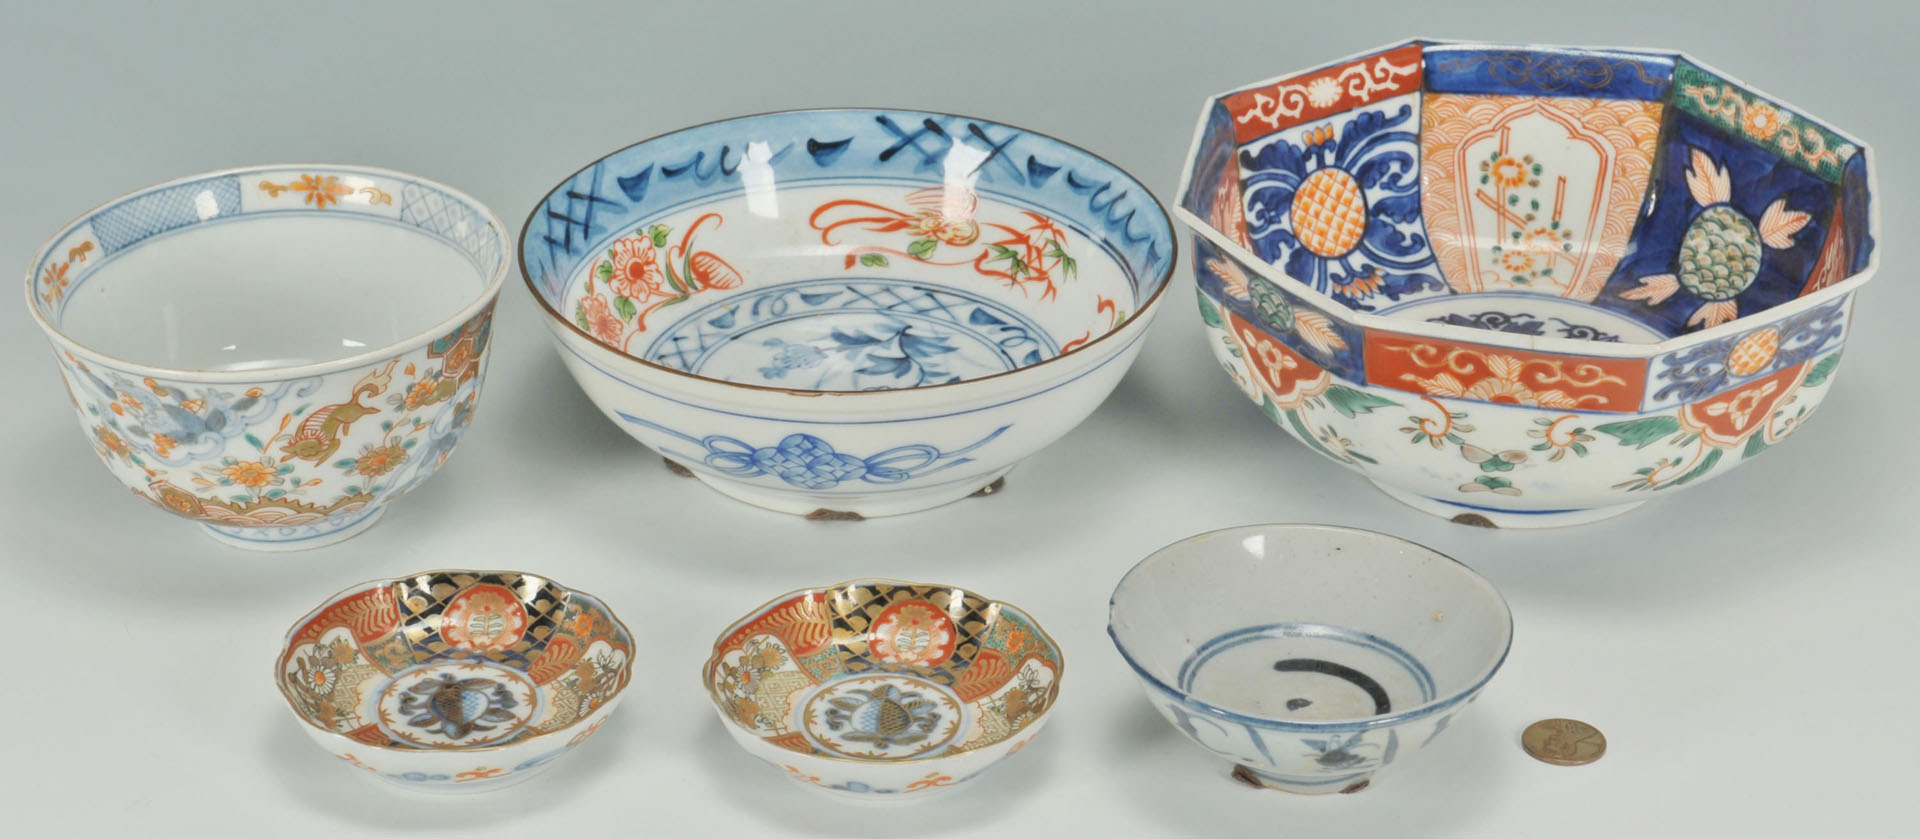 Group of 6 pcs Imari & Chinese porcelain